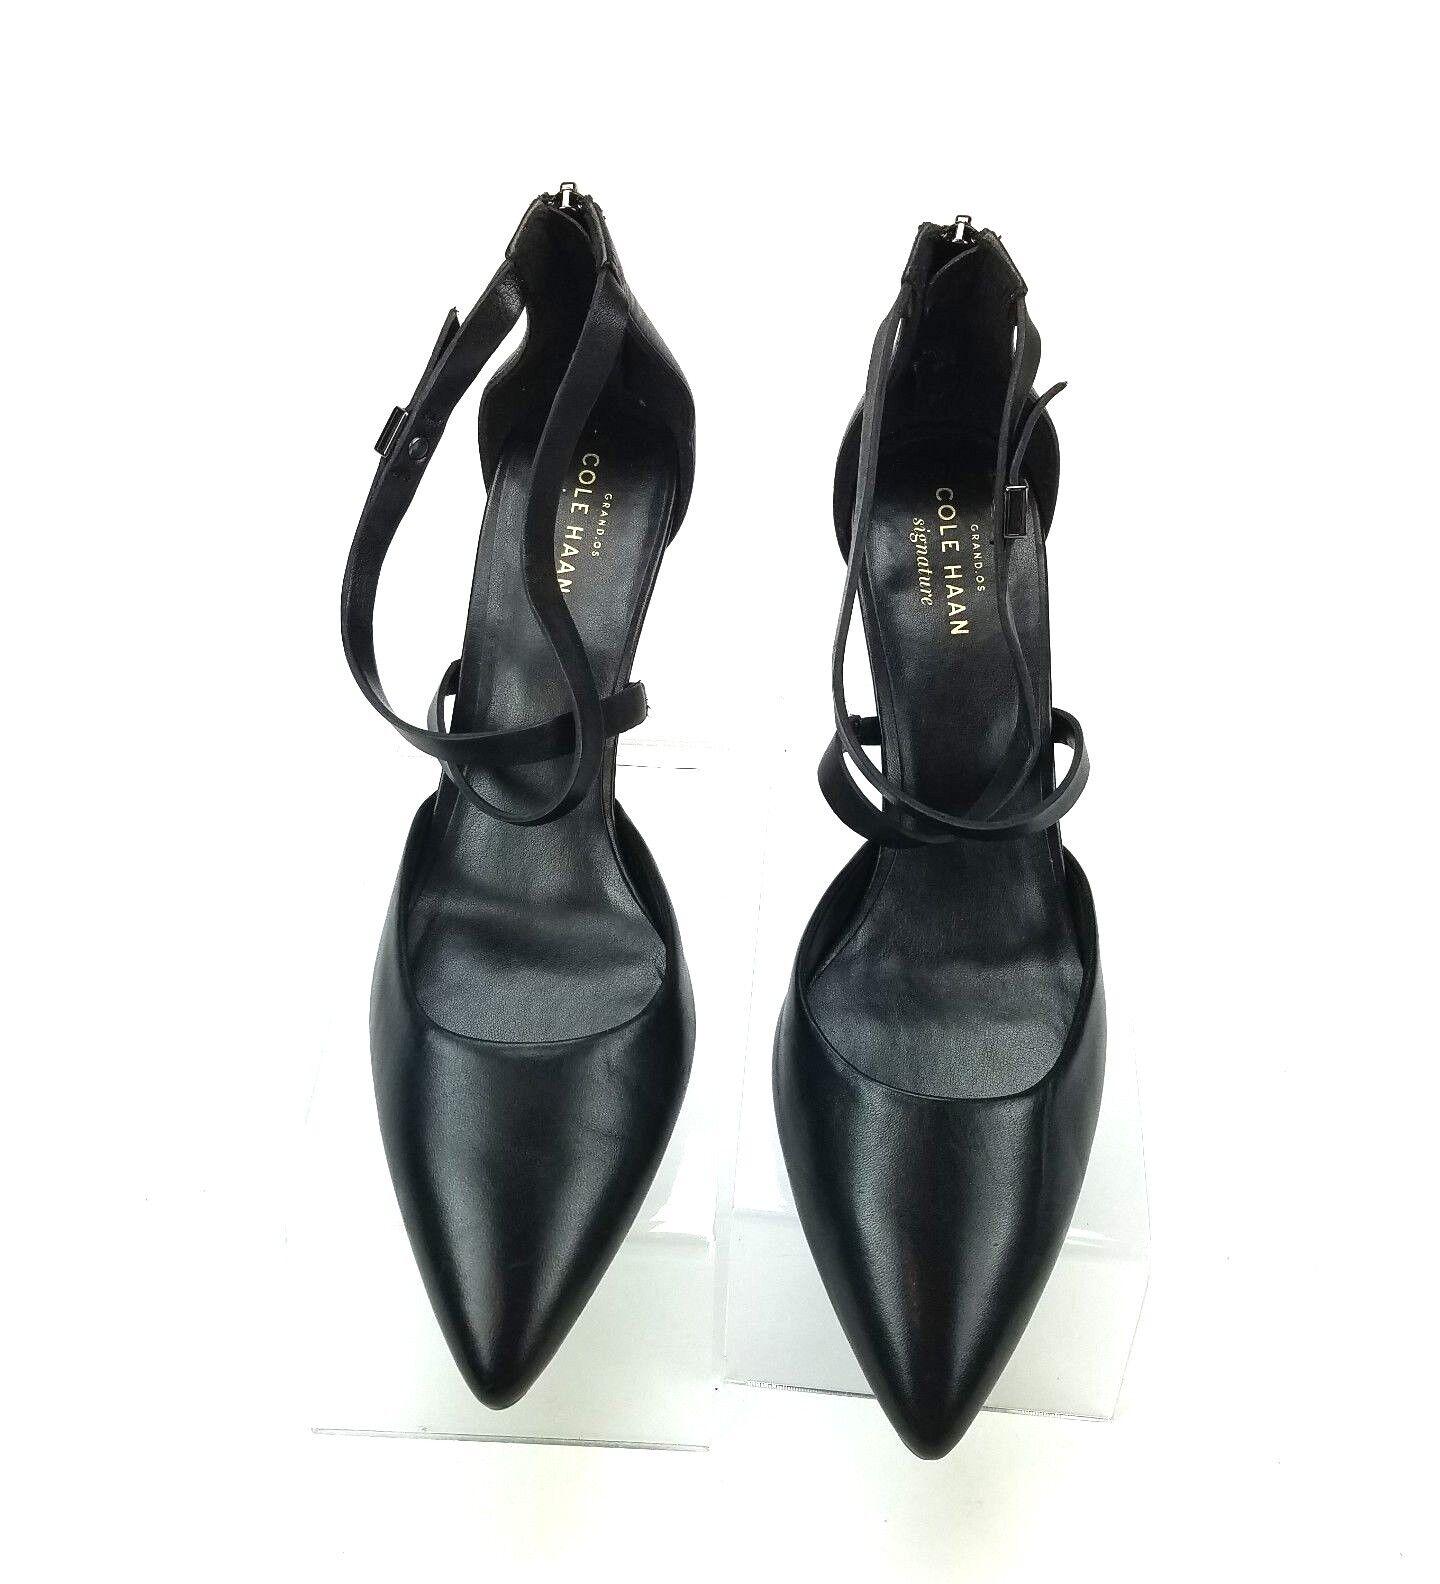 Cole Haan Signature Women Black Pointy Toe Strappy Heels 8B Zip back Heels